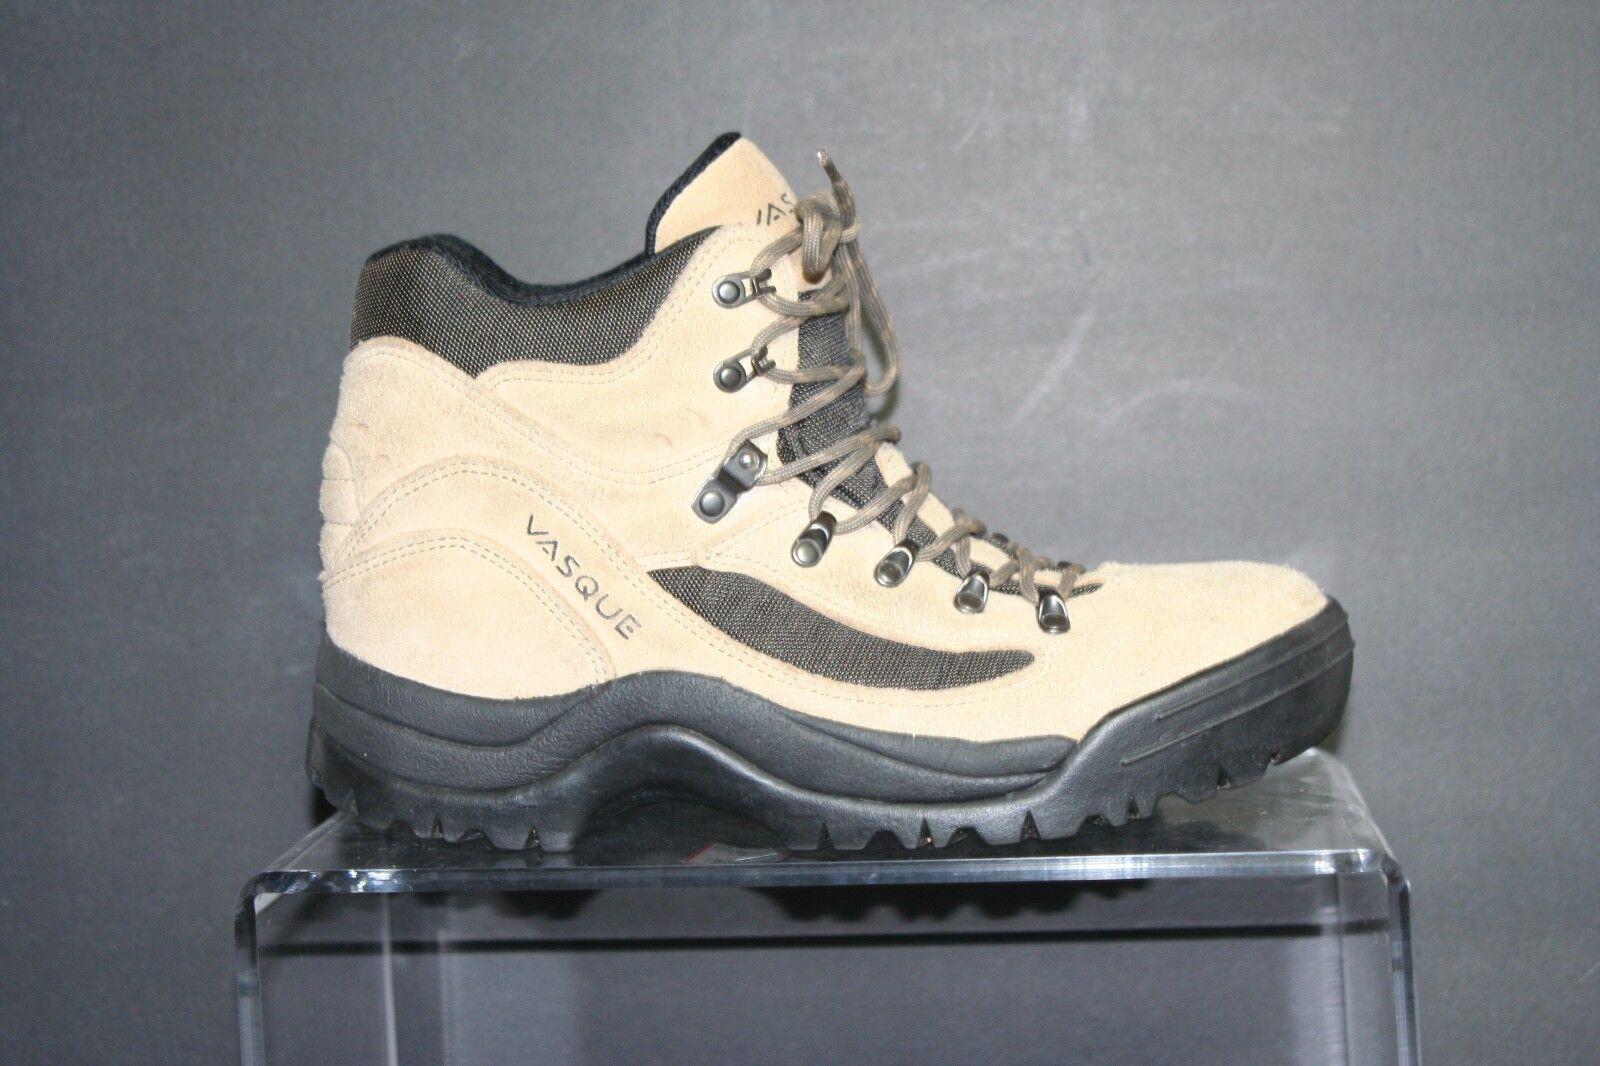 Vasque Red Wing Talus Trek High VTG '08 Hiking Boots Multi Beige Women 9.5 Trail